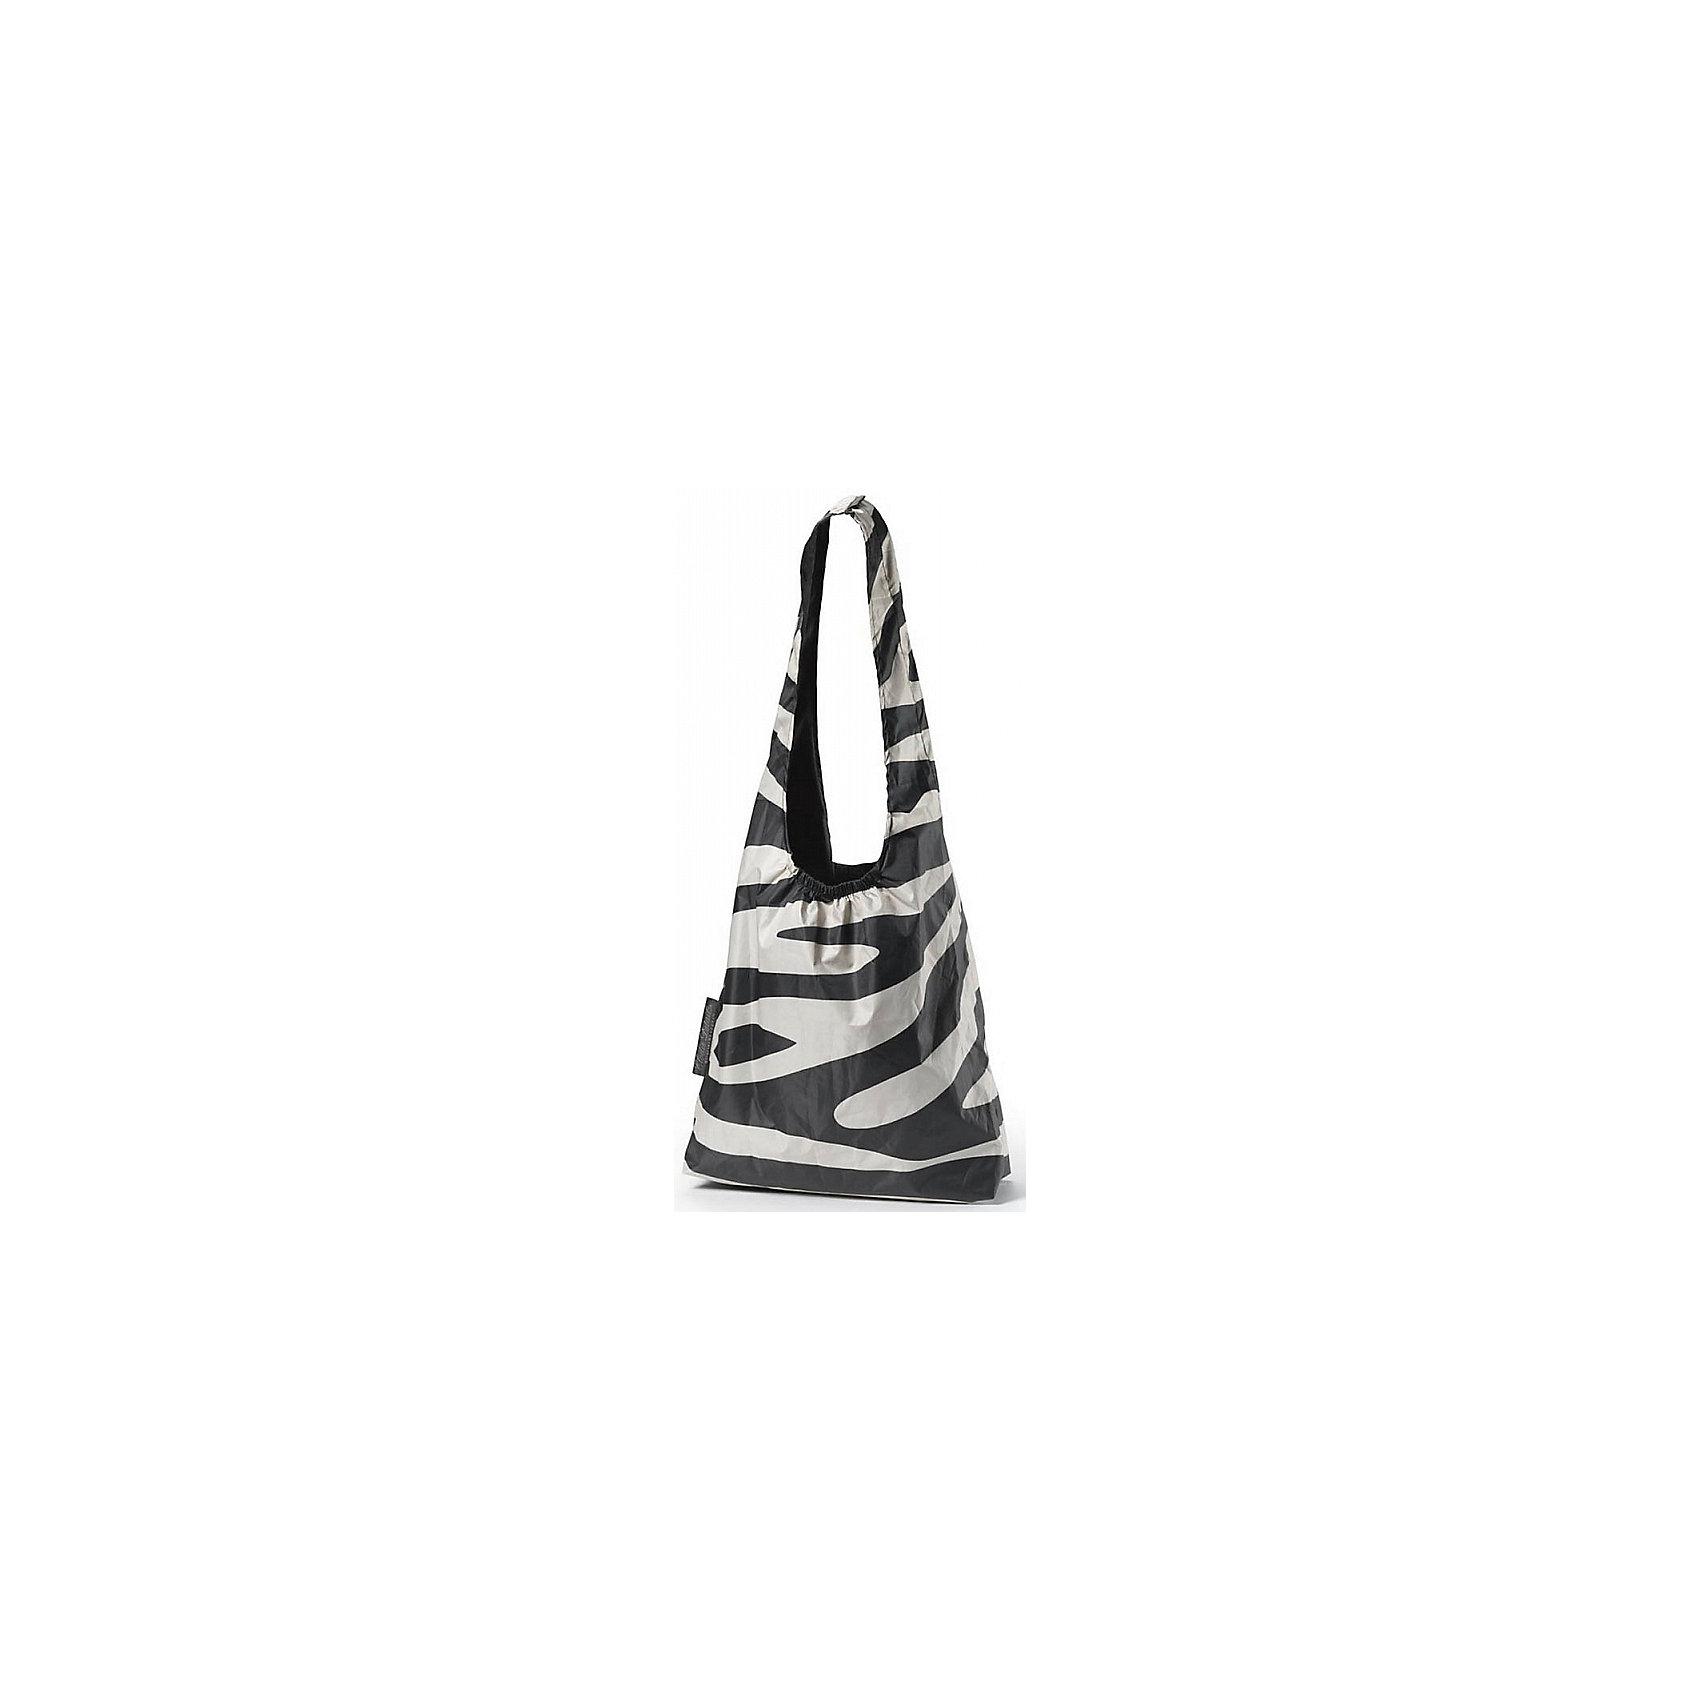 Сумка Zebra Sunshine Stroller Shopper, Elodie Details